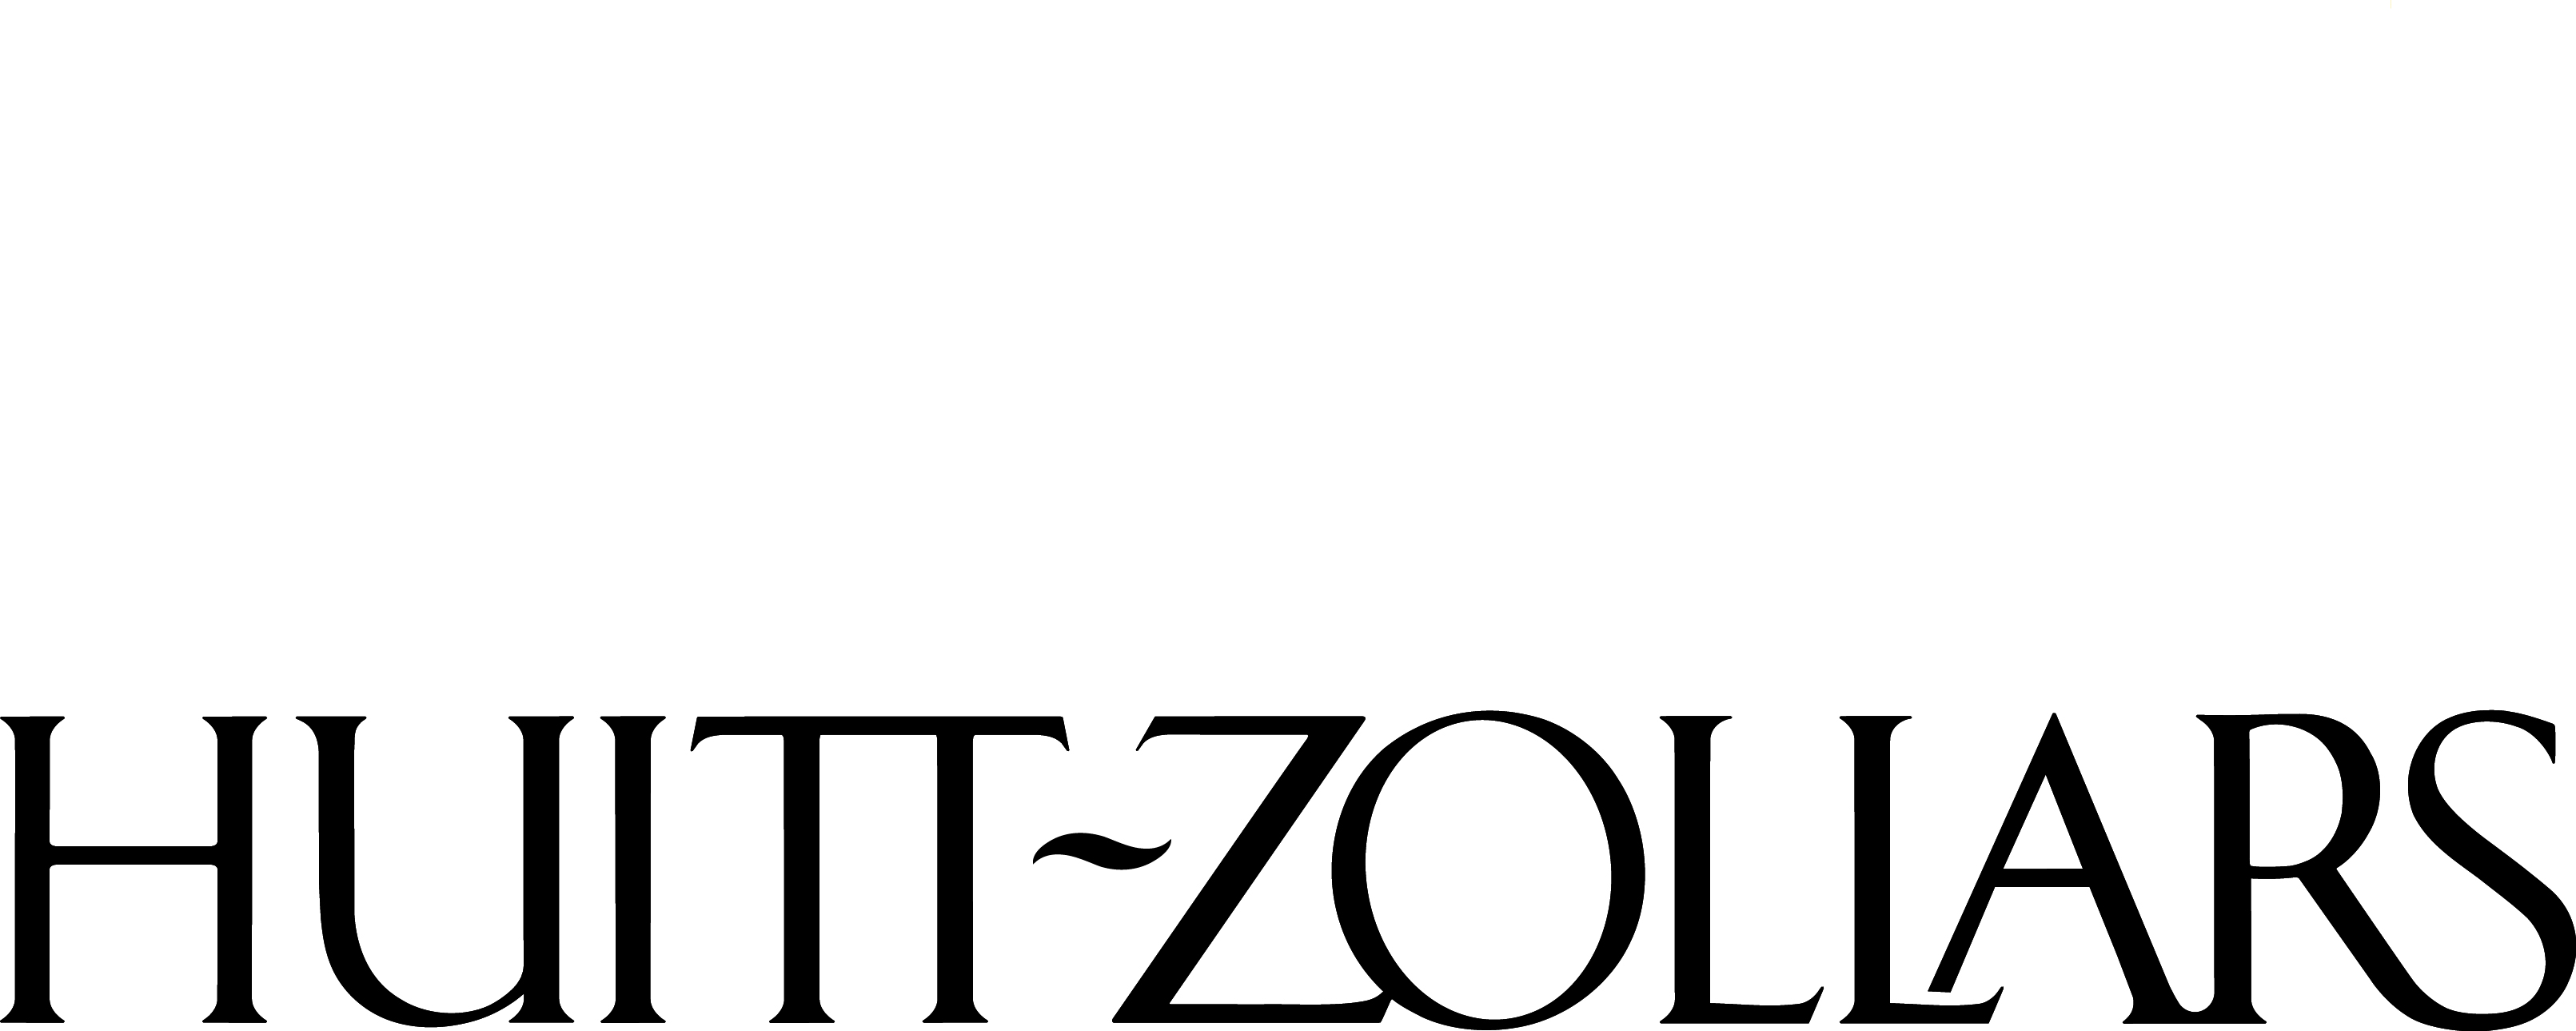 CELEBRATE ARCHITECTURE - Huitt-Zollars logo